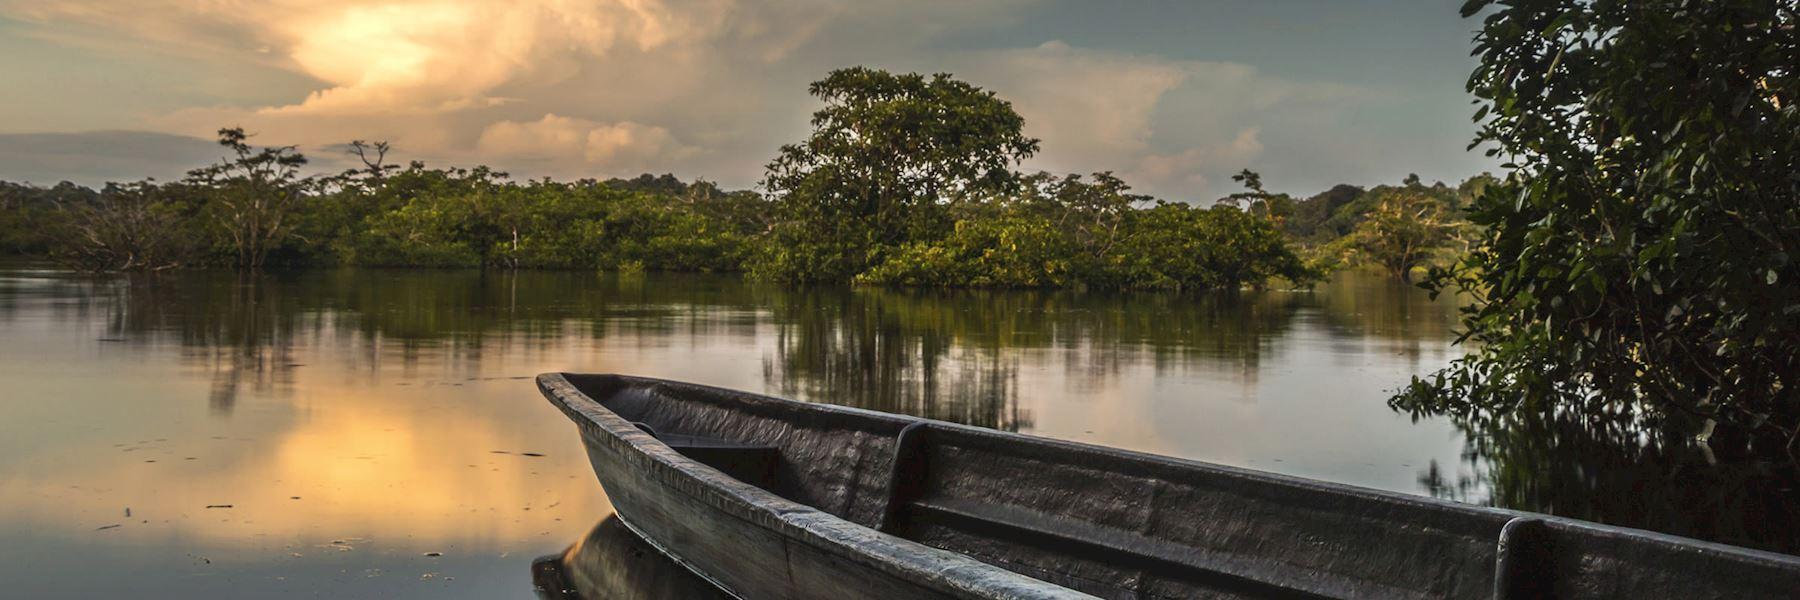 Visit the Amazon, Ecuador